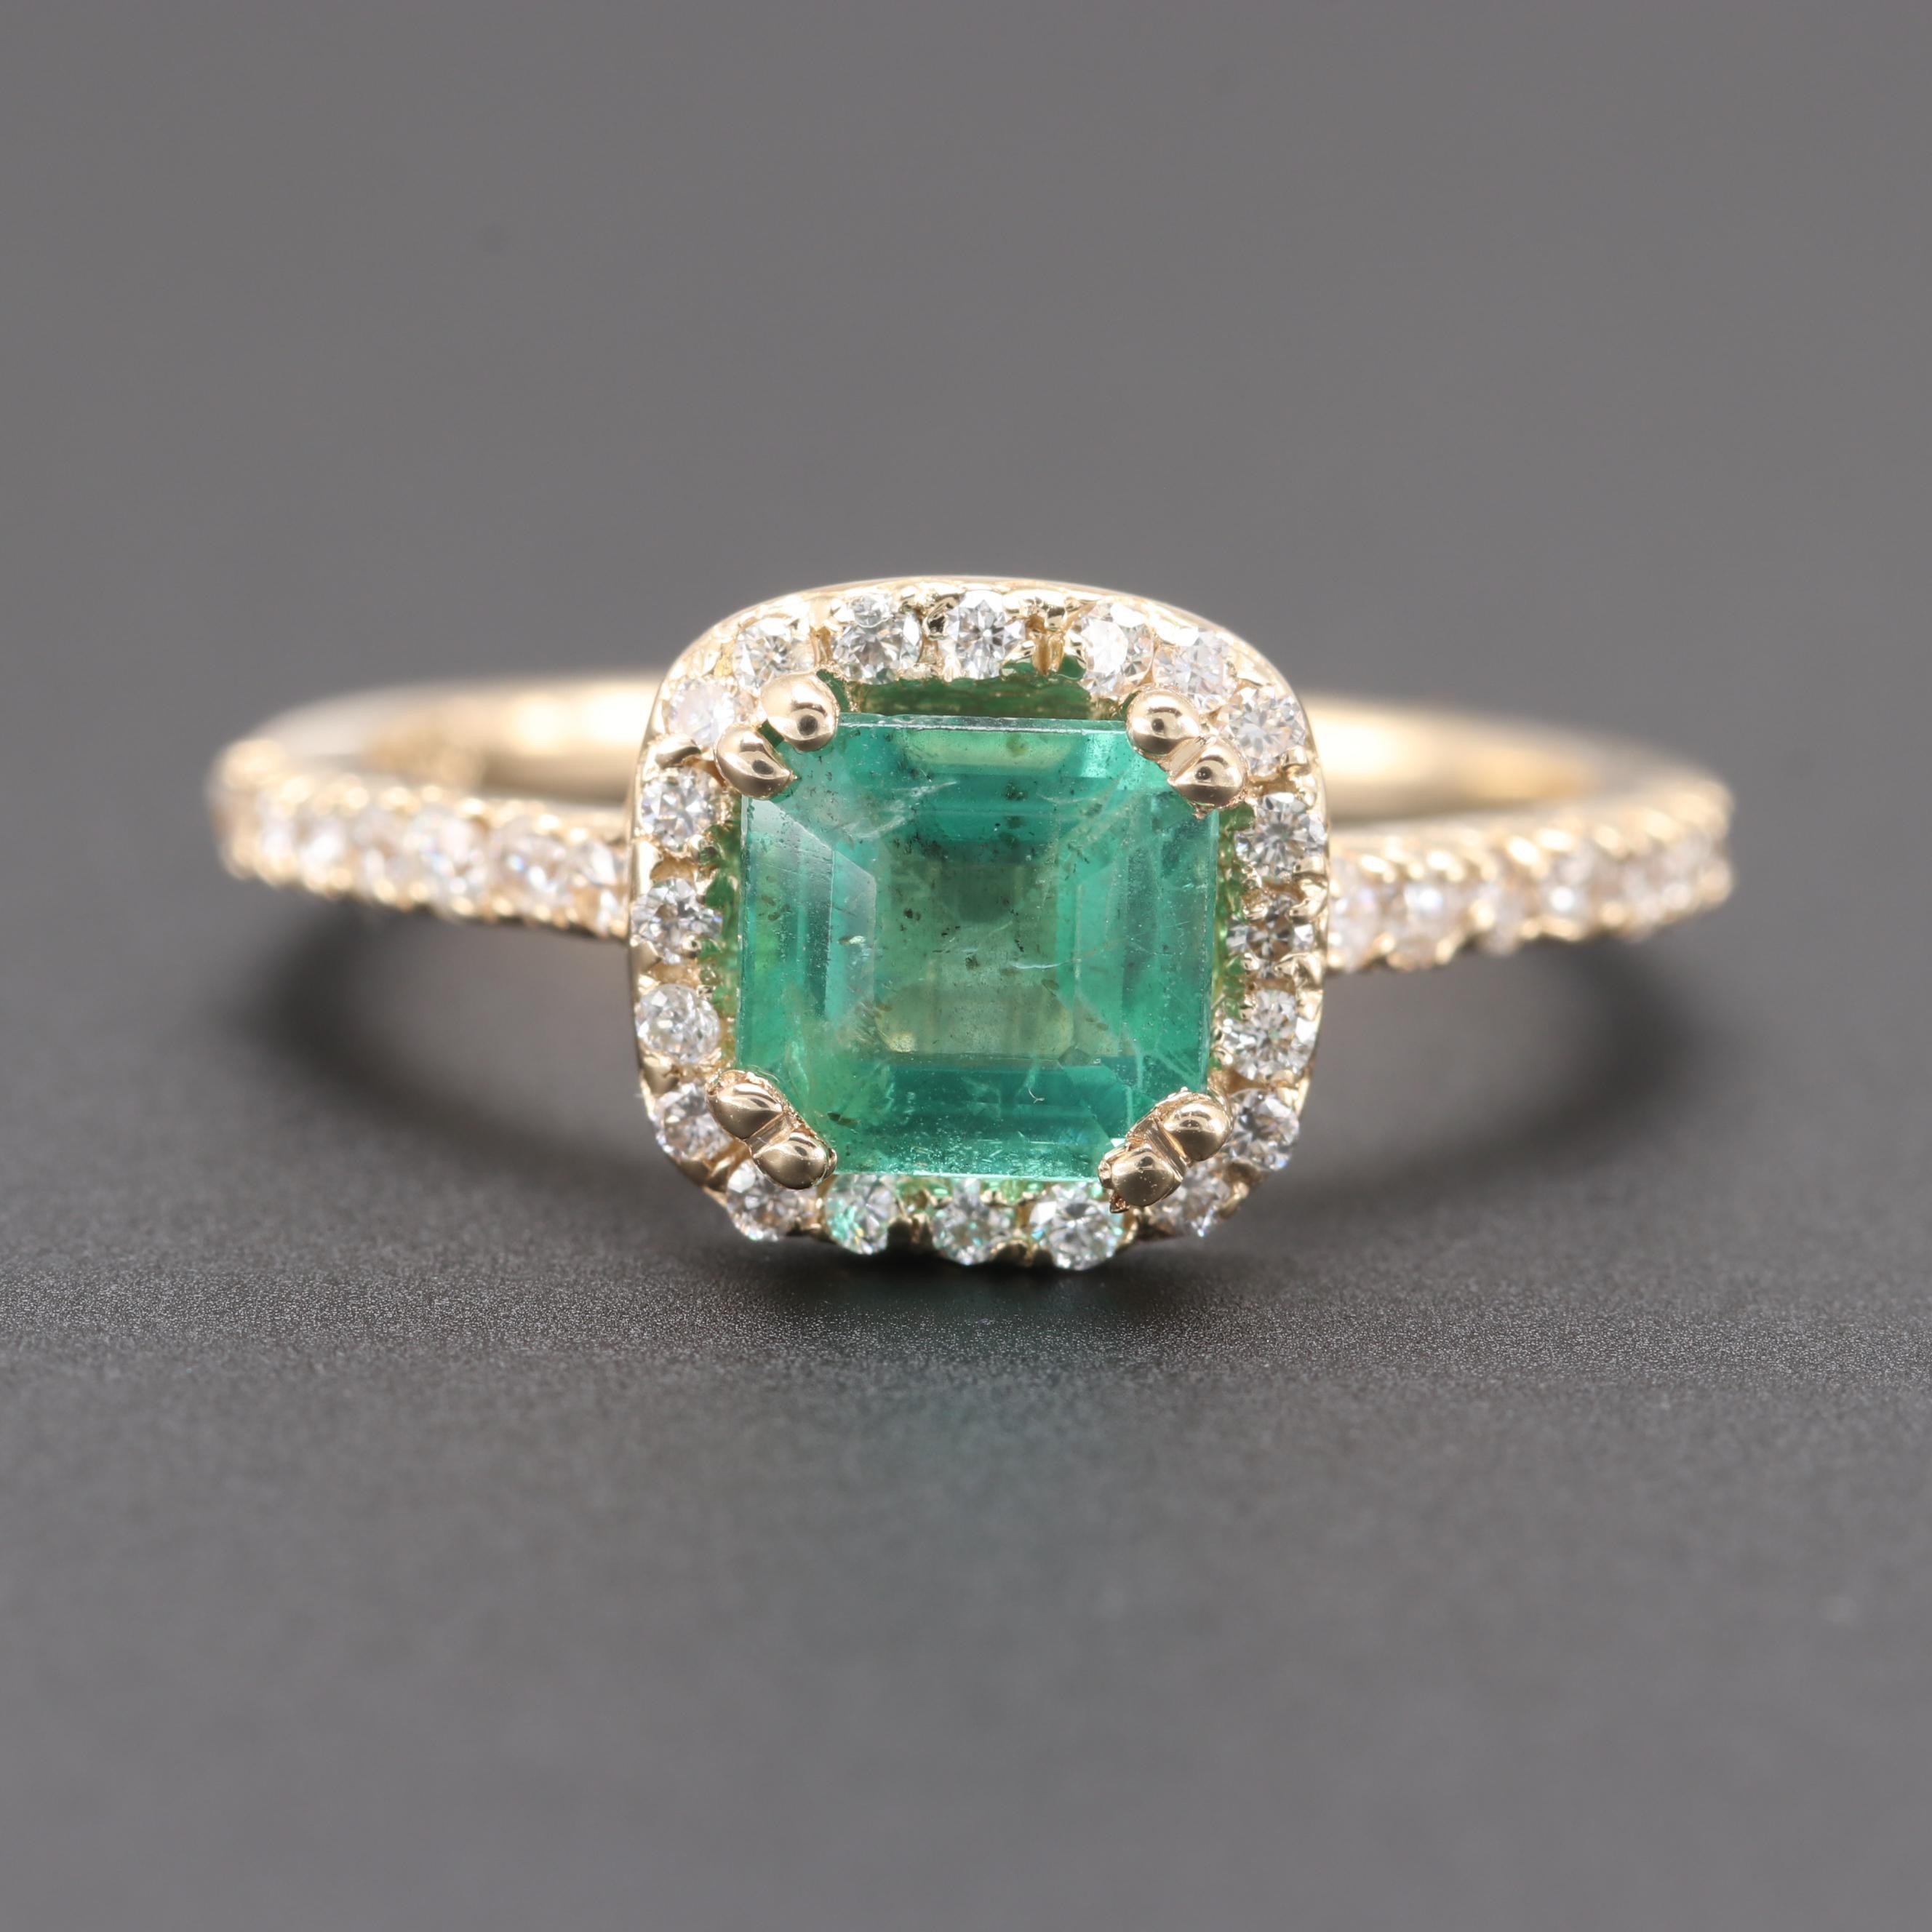 14K Yellow Gold 1.01 CT Emerald and Diamond Ring